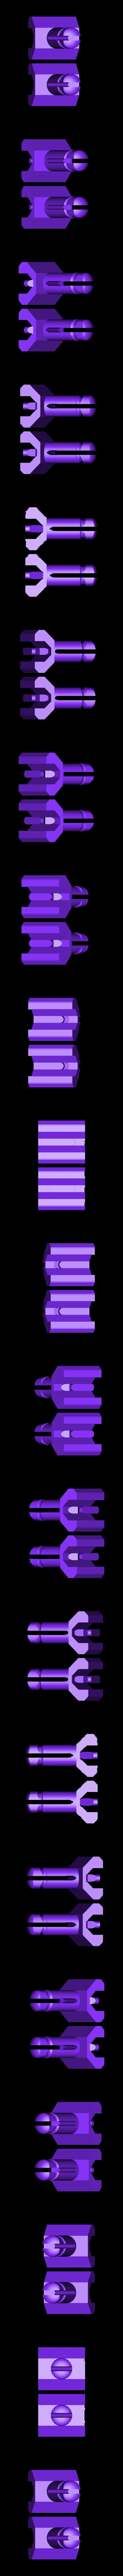 GEAR-BASE_PEGS_R2.stl Download free STL file Math Gear(s) • 3D print design, WorksBySolo